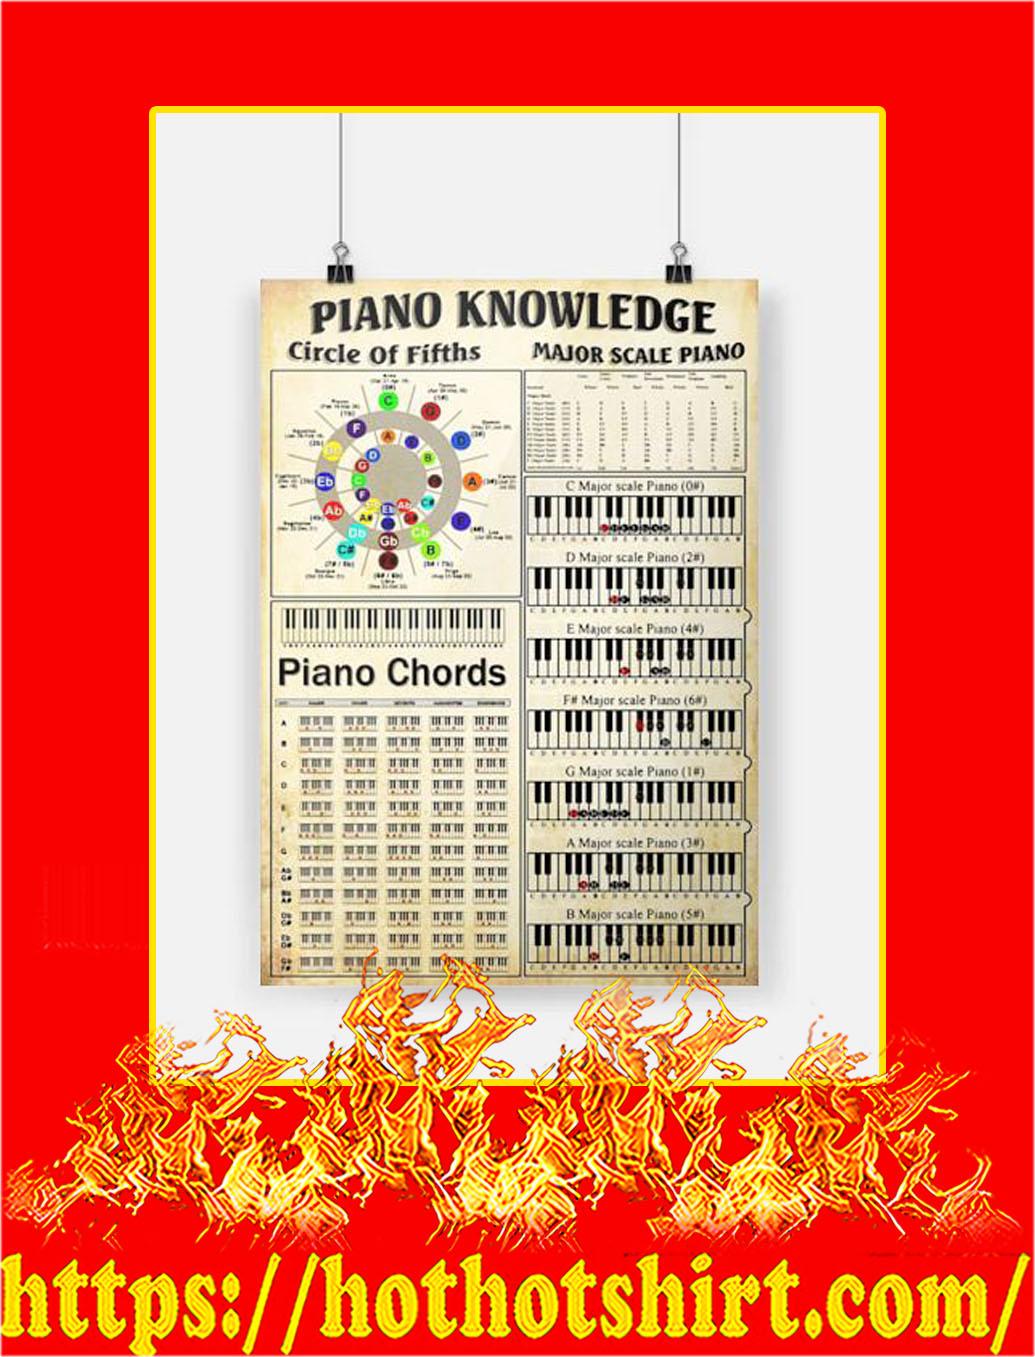 Pinano Knowledge Poster - A2